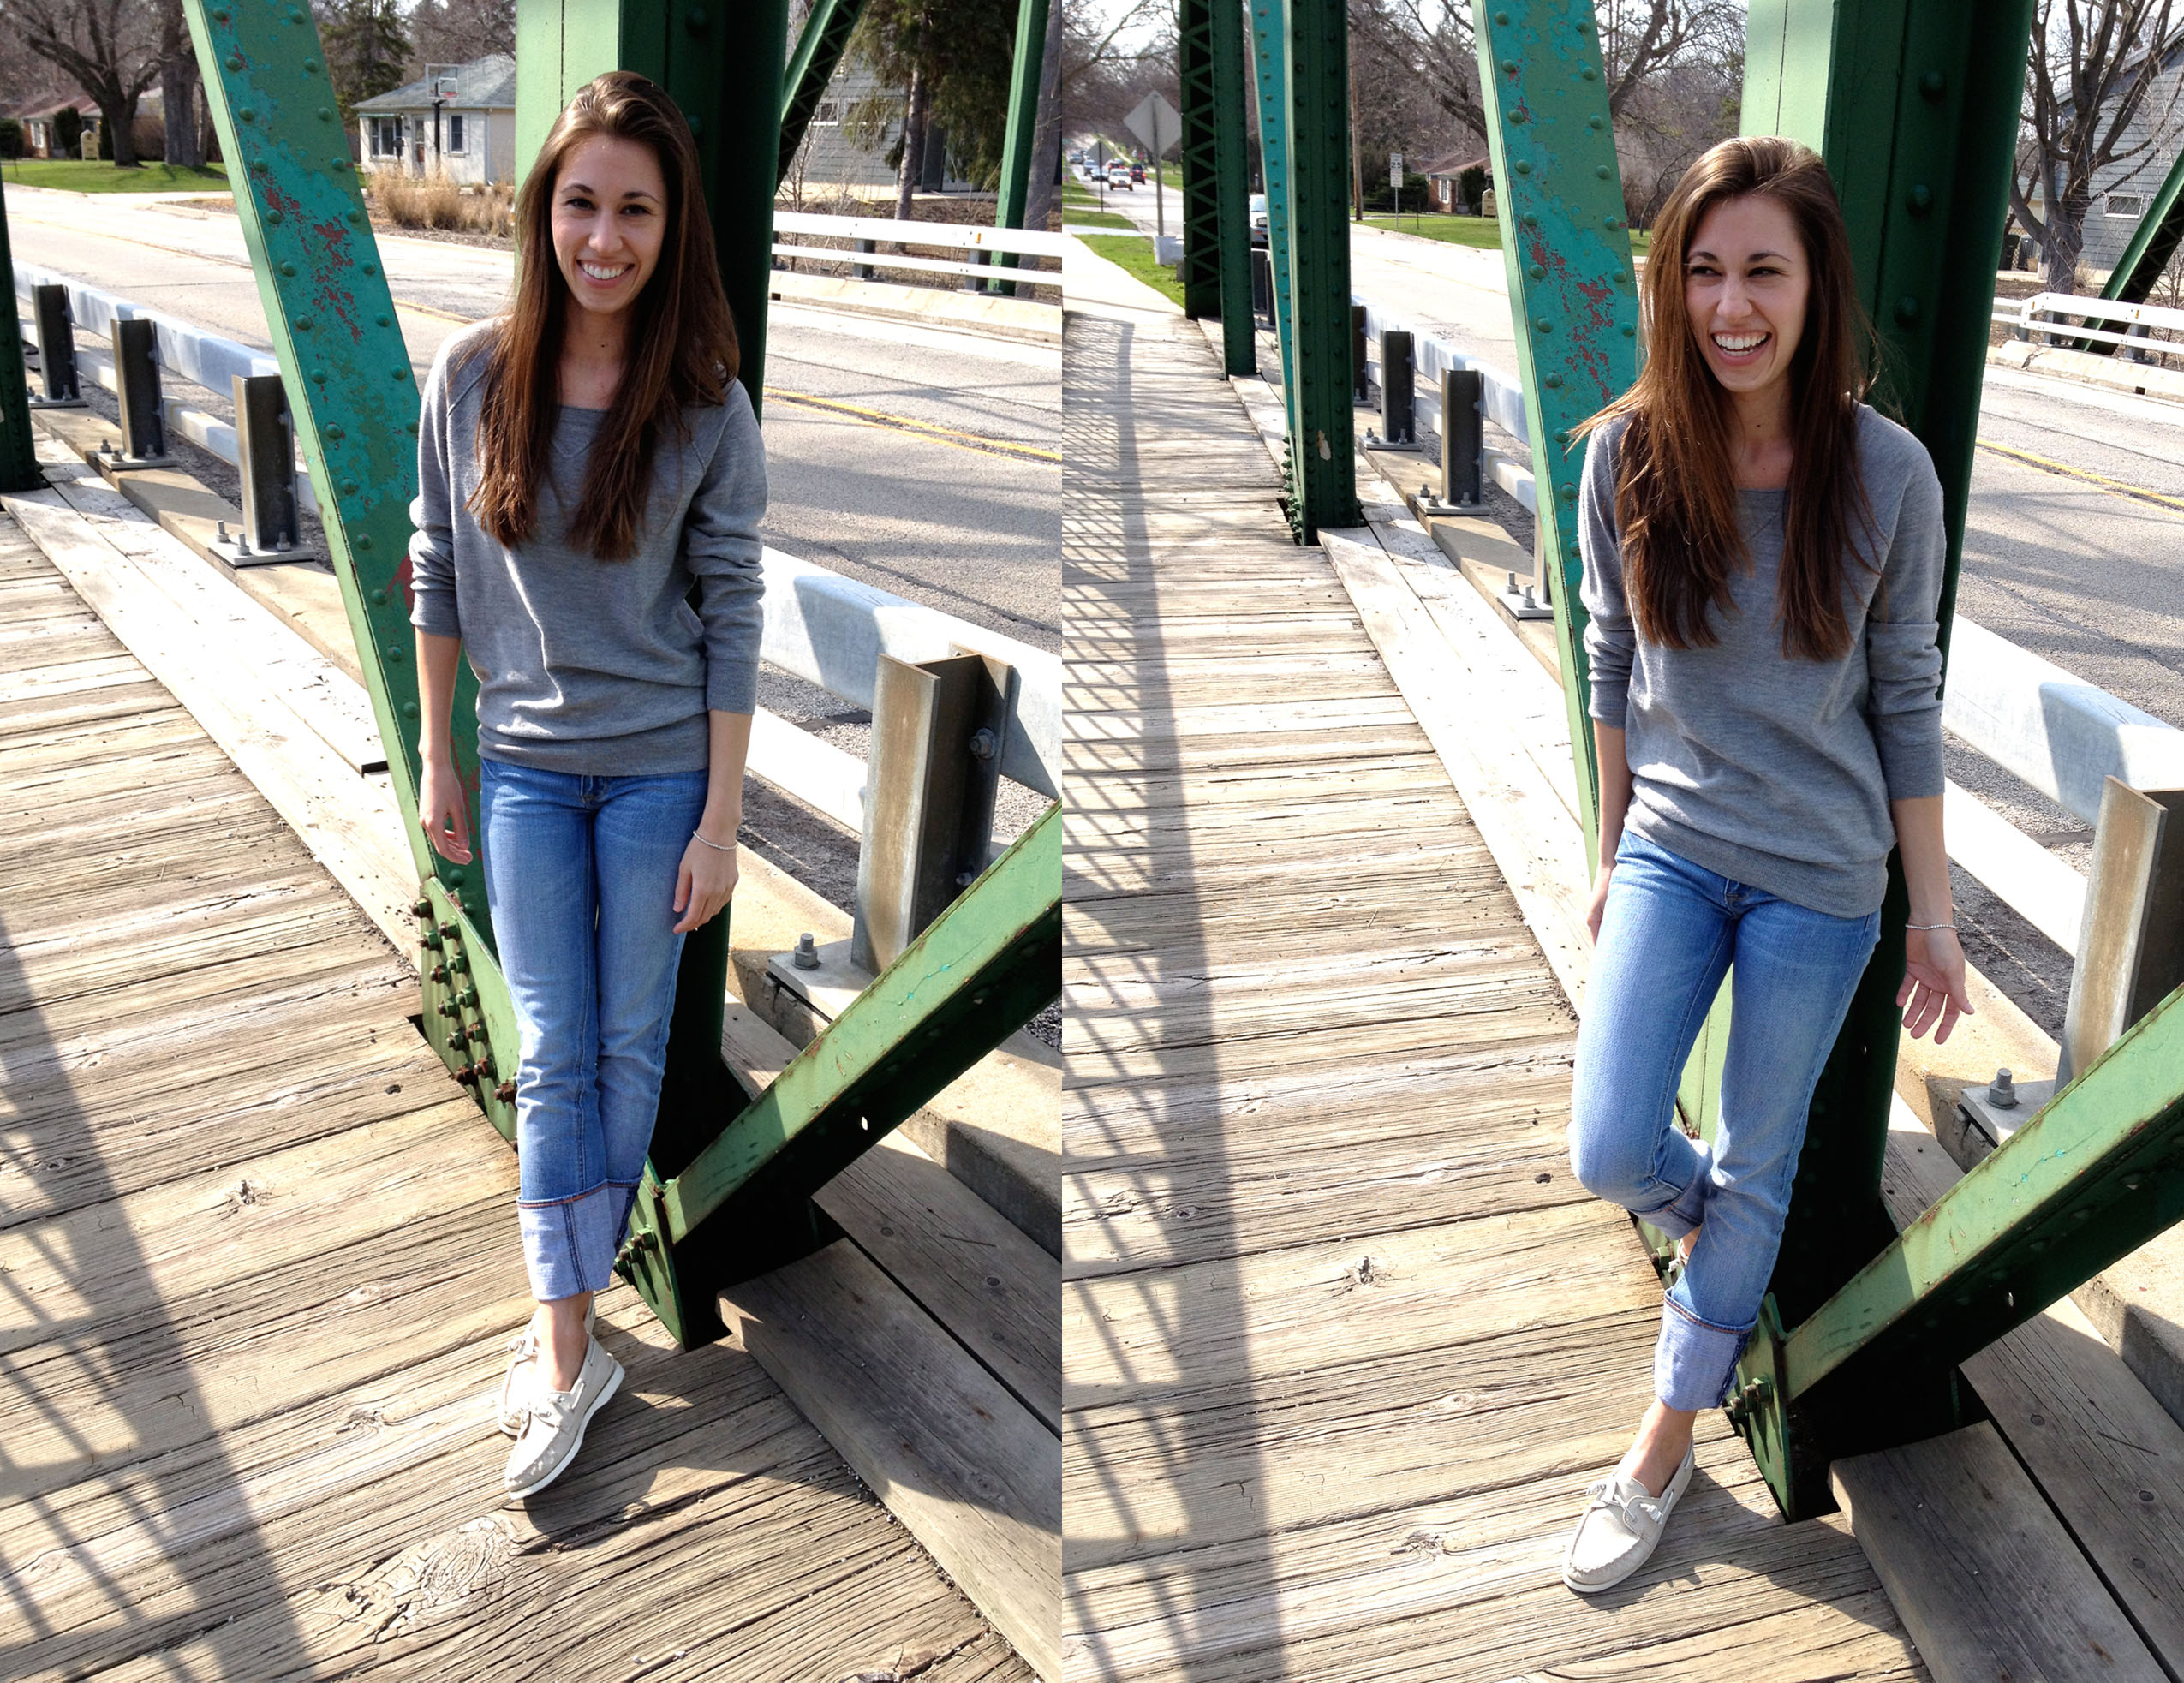 the green bridge asimplestatement